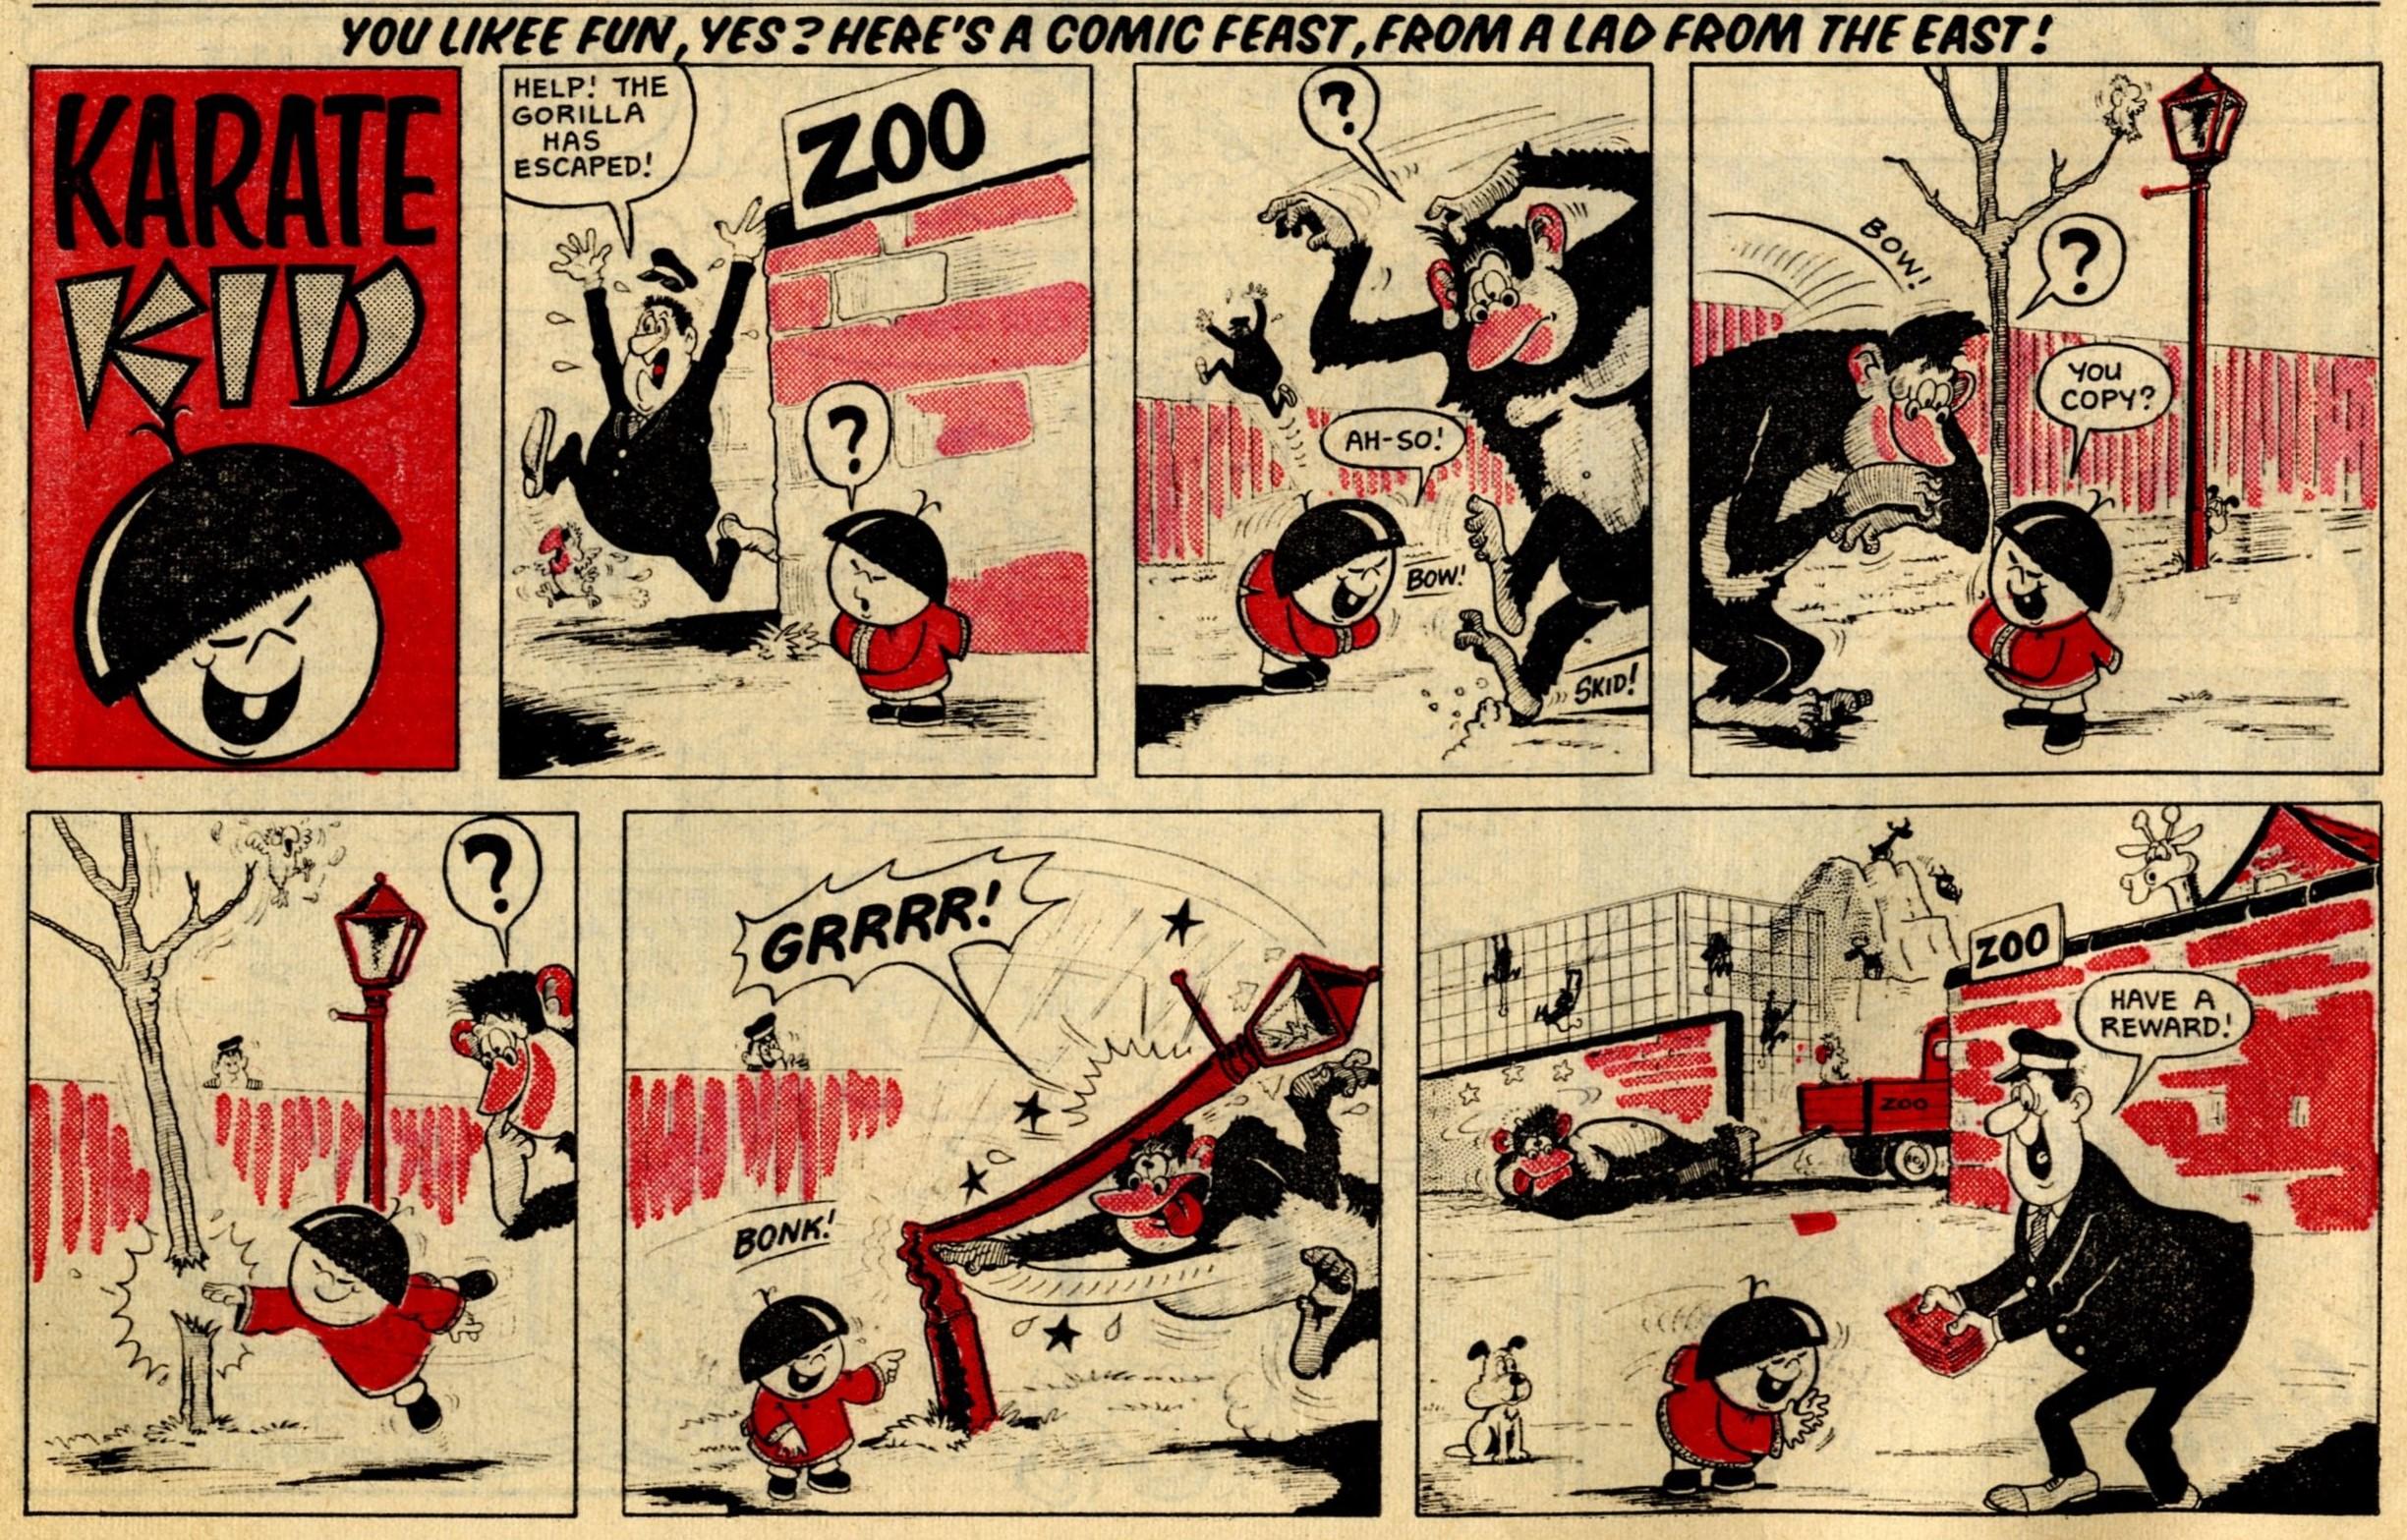 Karate Kid: Terry Bave (artist)